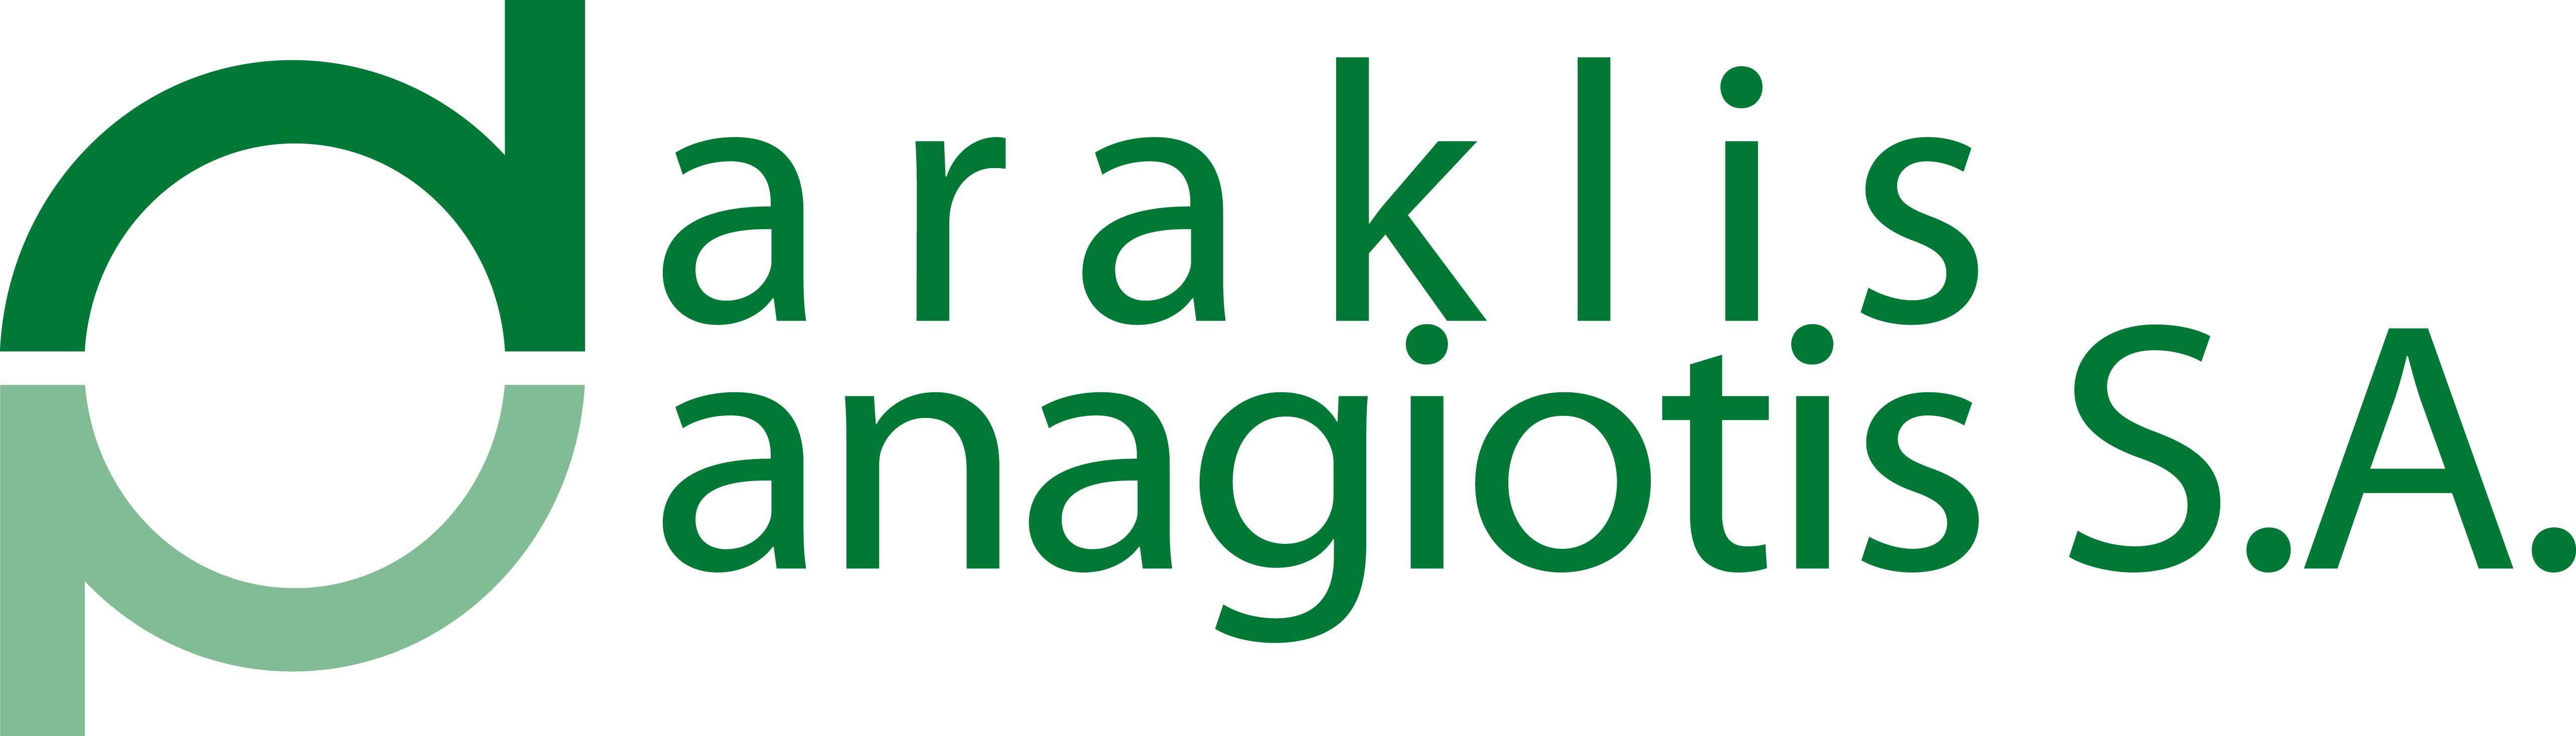 PANAGIOTIS DARAKLIS SA